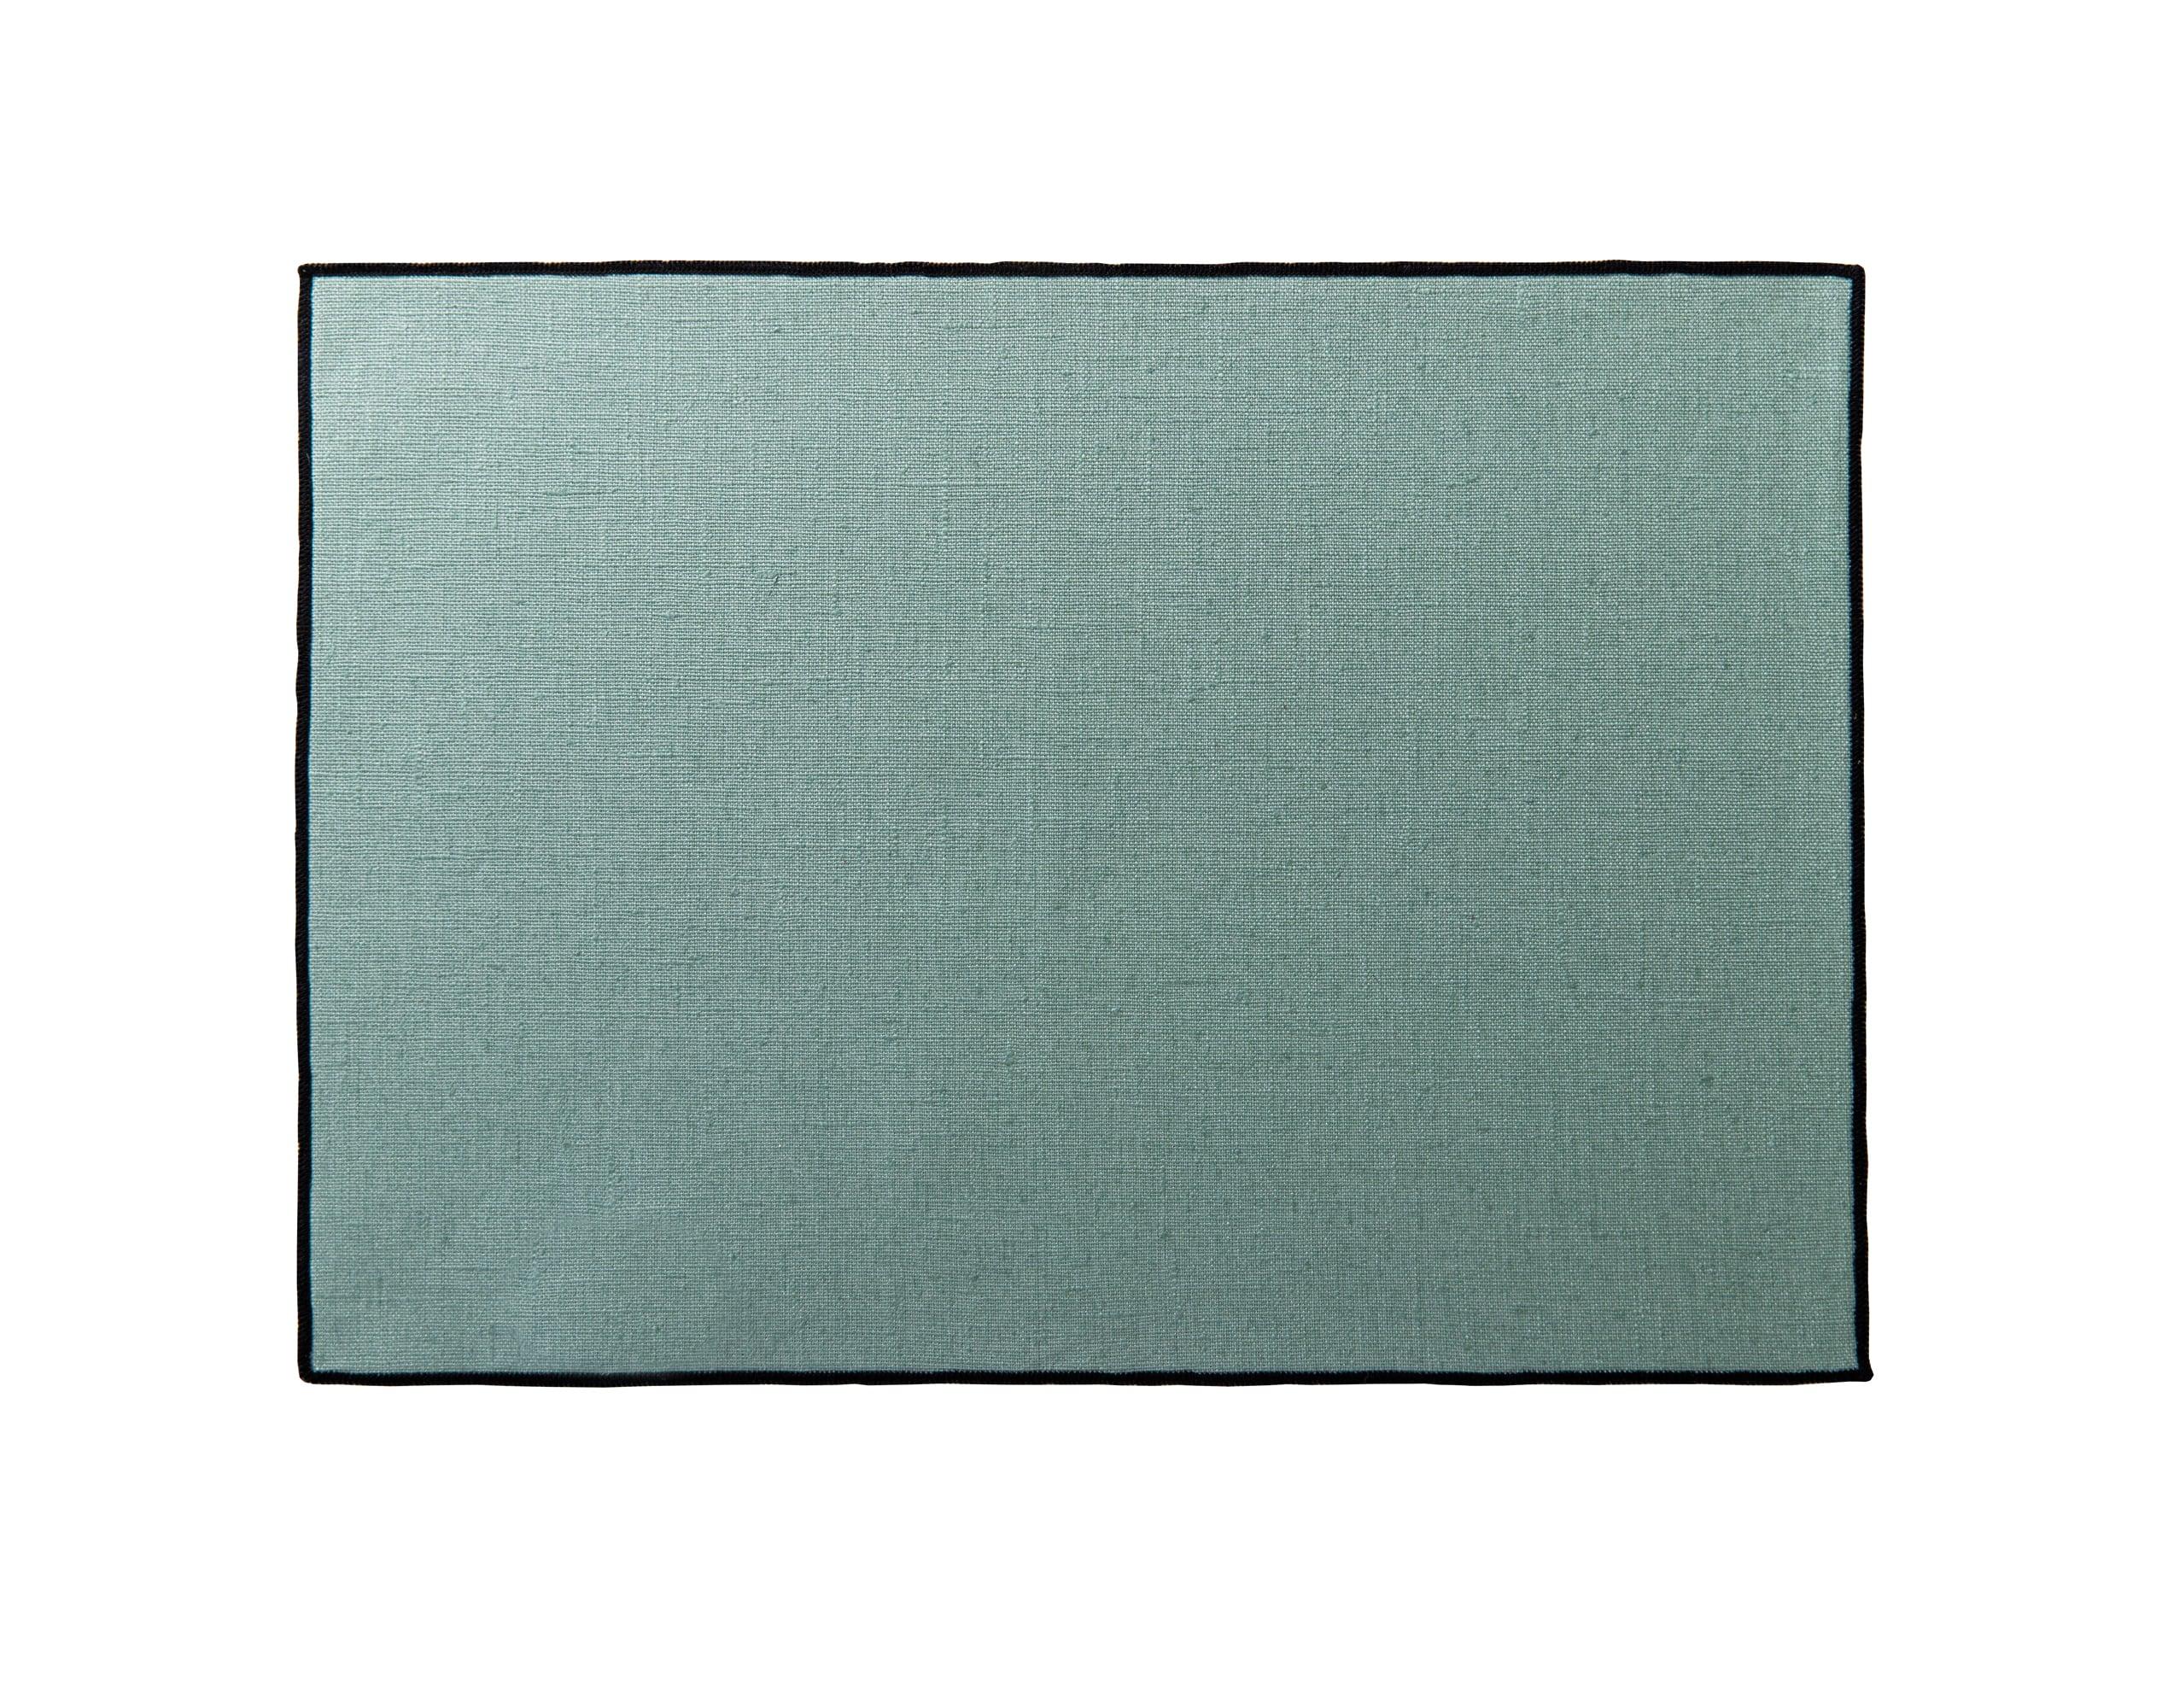 Lot de 4 sets de table vert céladon en lin 35x48